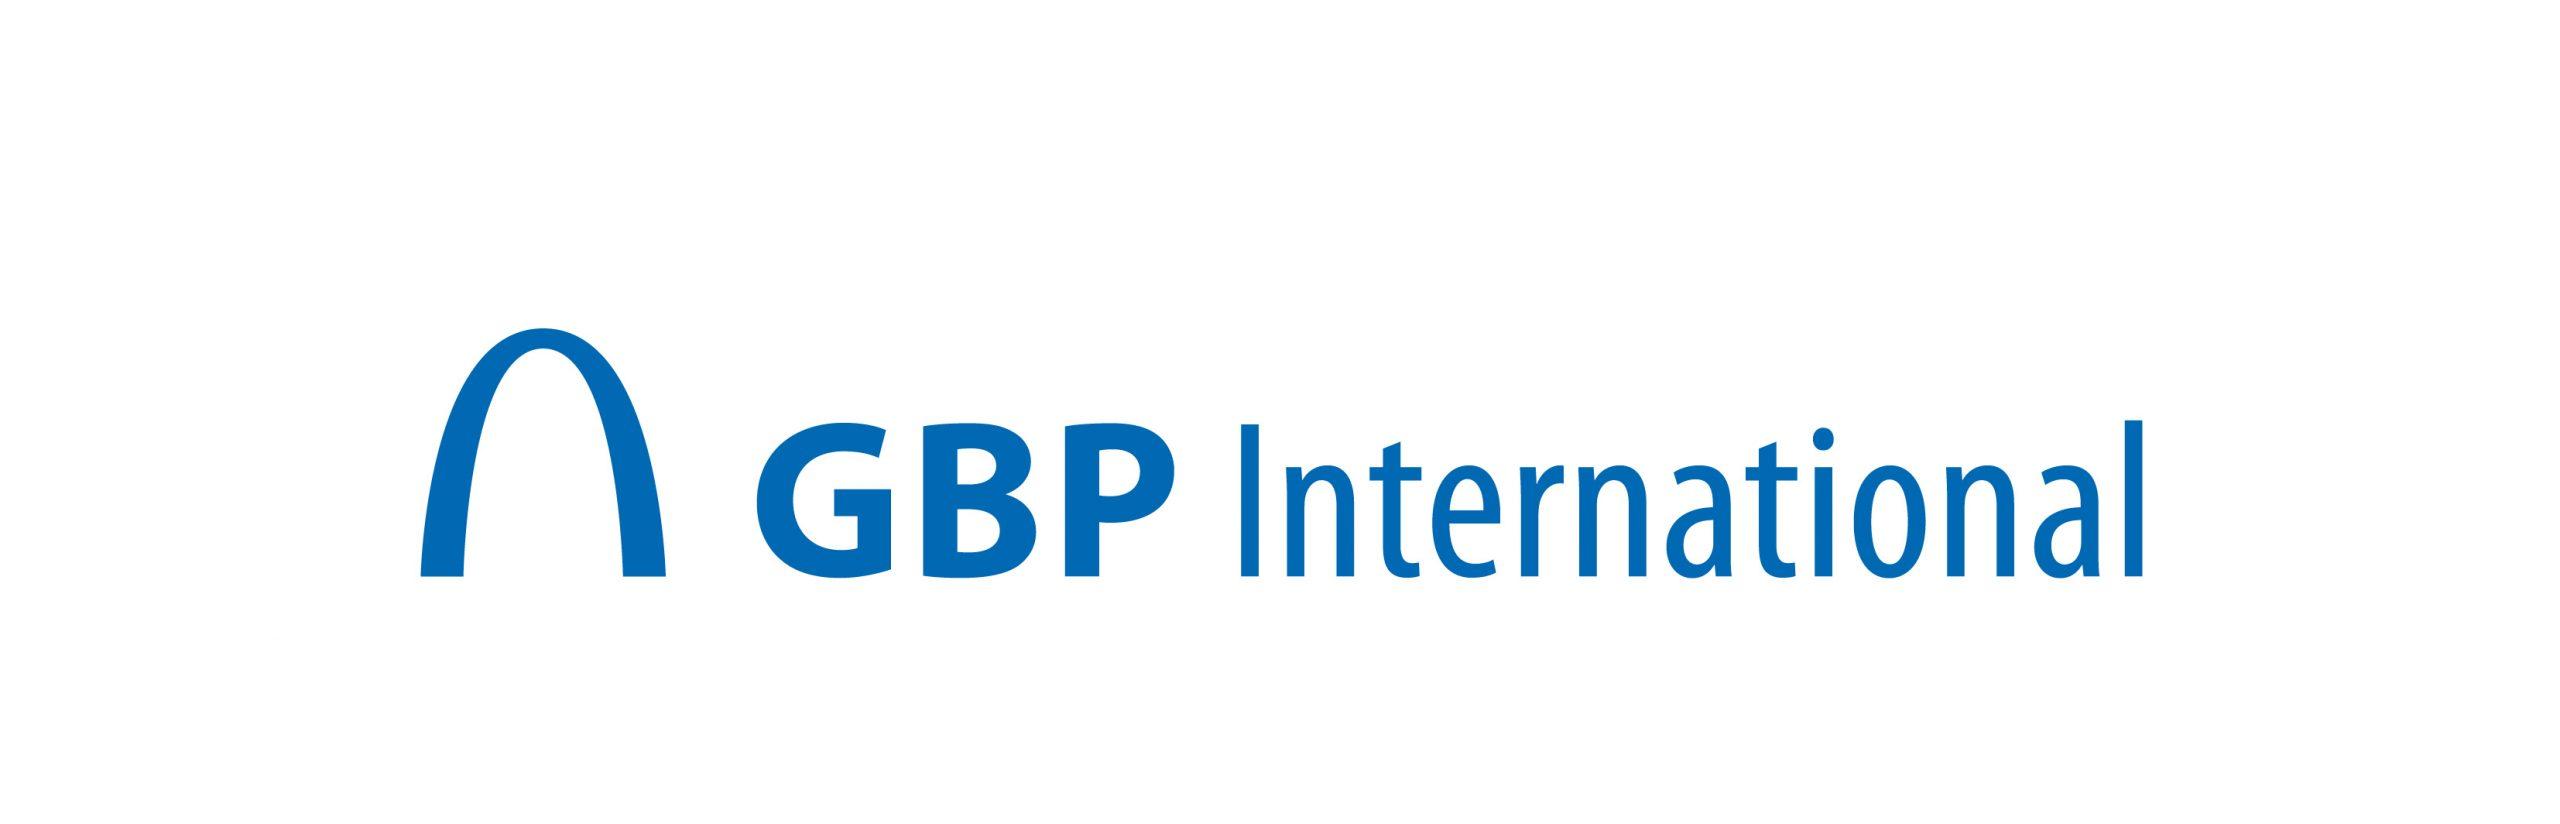 GBP International